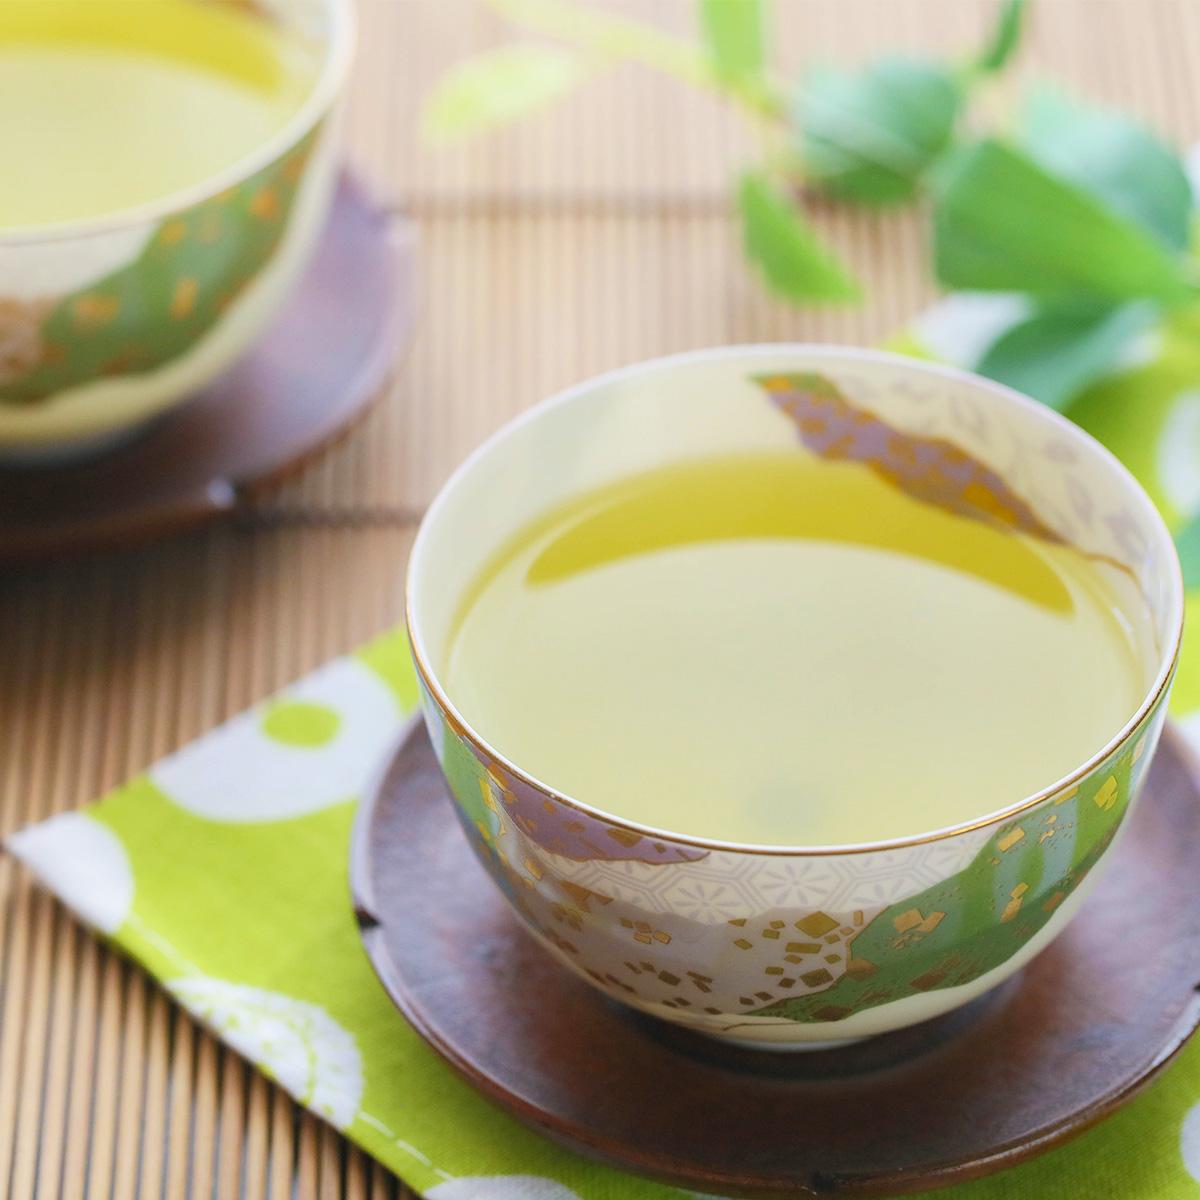 OrganicGarden 美味しい関係 農薬・肥料不使用 自然と人をつなぐお茶 静岡県産 煎茶〔100g〕